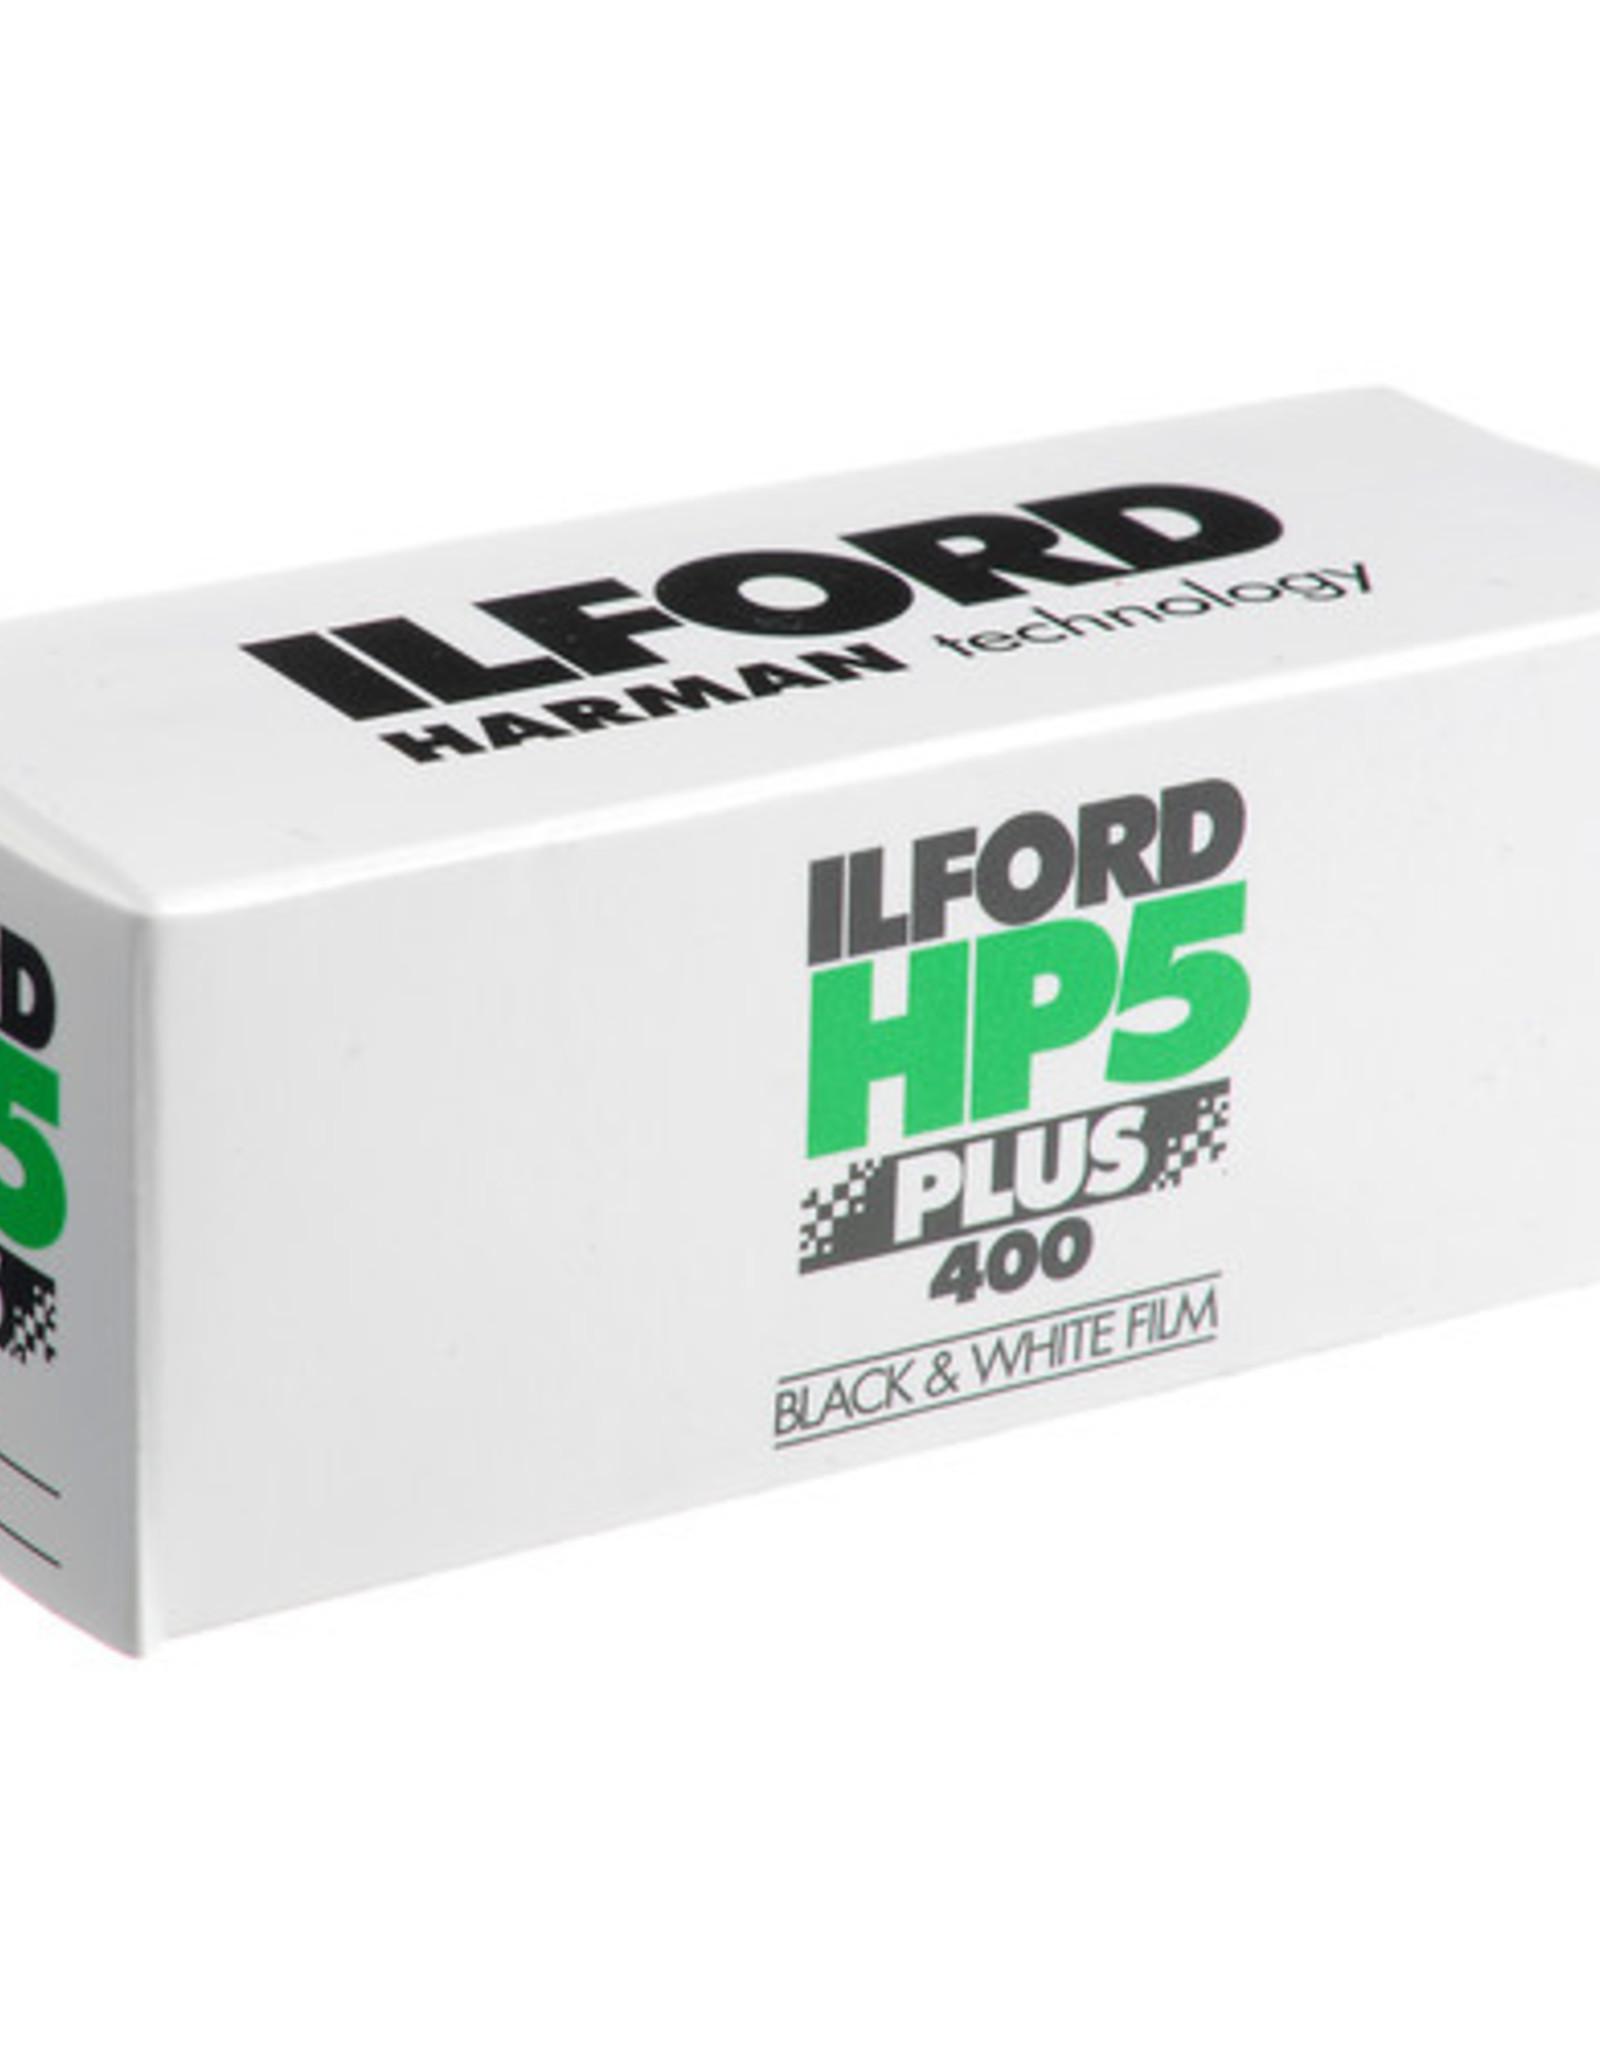 ILFORD HP5 120 FILM